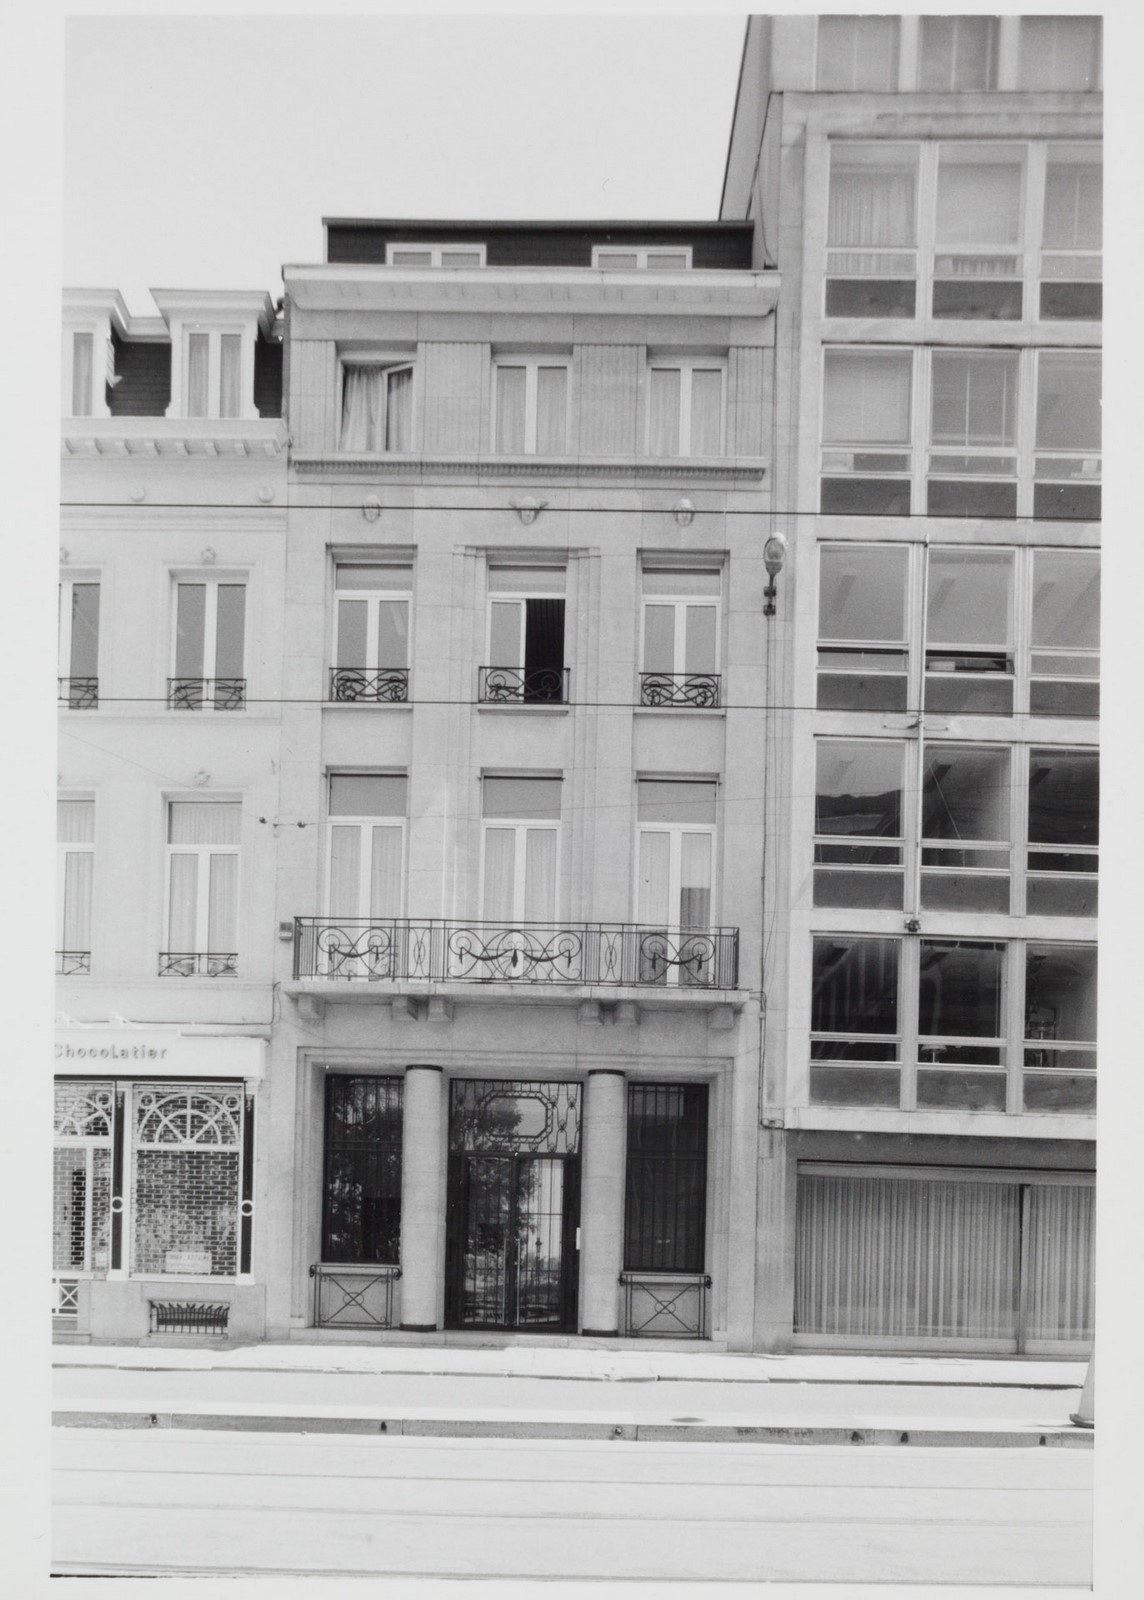 rue Royale 71. Anc.